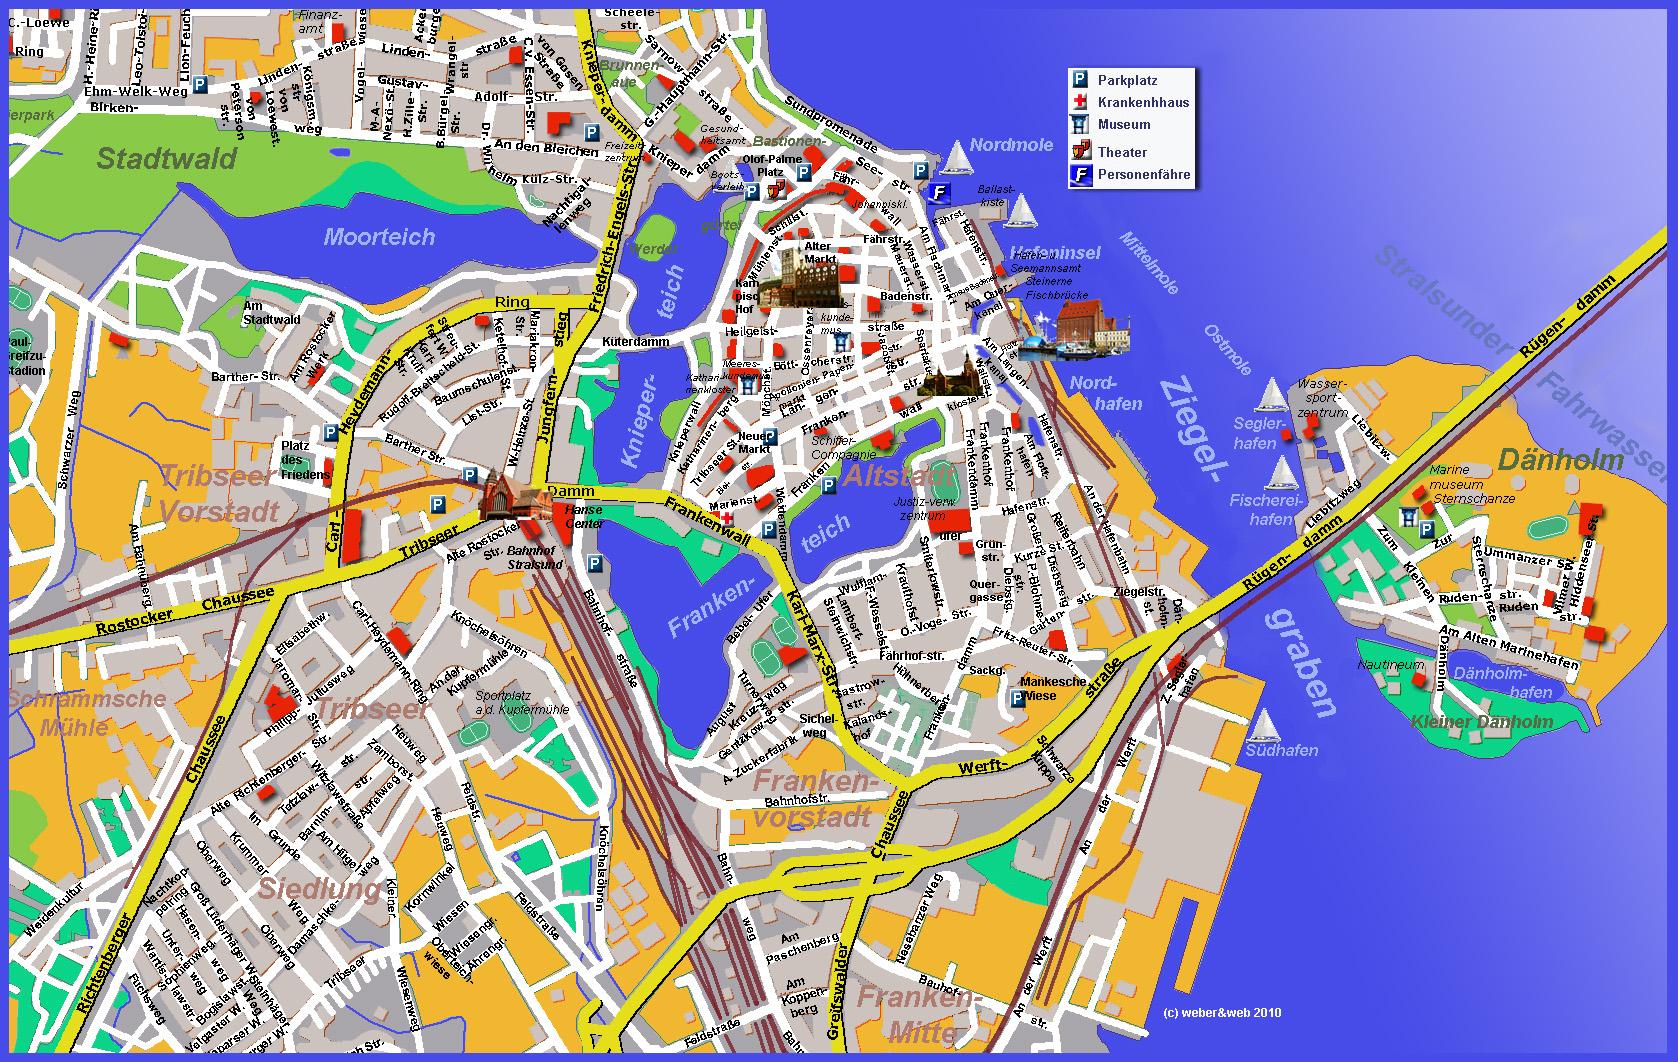 munich tourist map with Stralsund Tourist Map on Konigsee Map moreover Los Lagos De Munich further Braunschweig Tourist Map as well Isla Cortes Altota Navolato 2 together with Bmw Welt And The Bmw Museum In Munich.